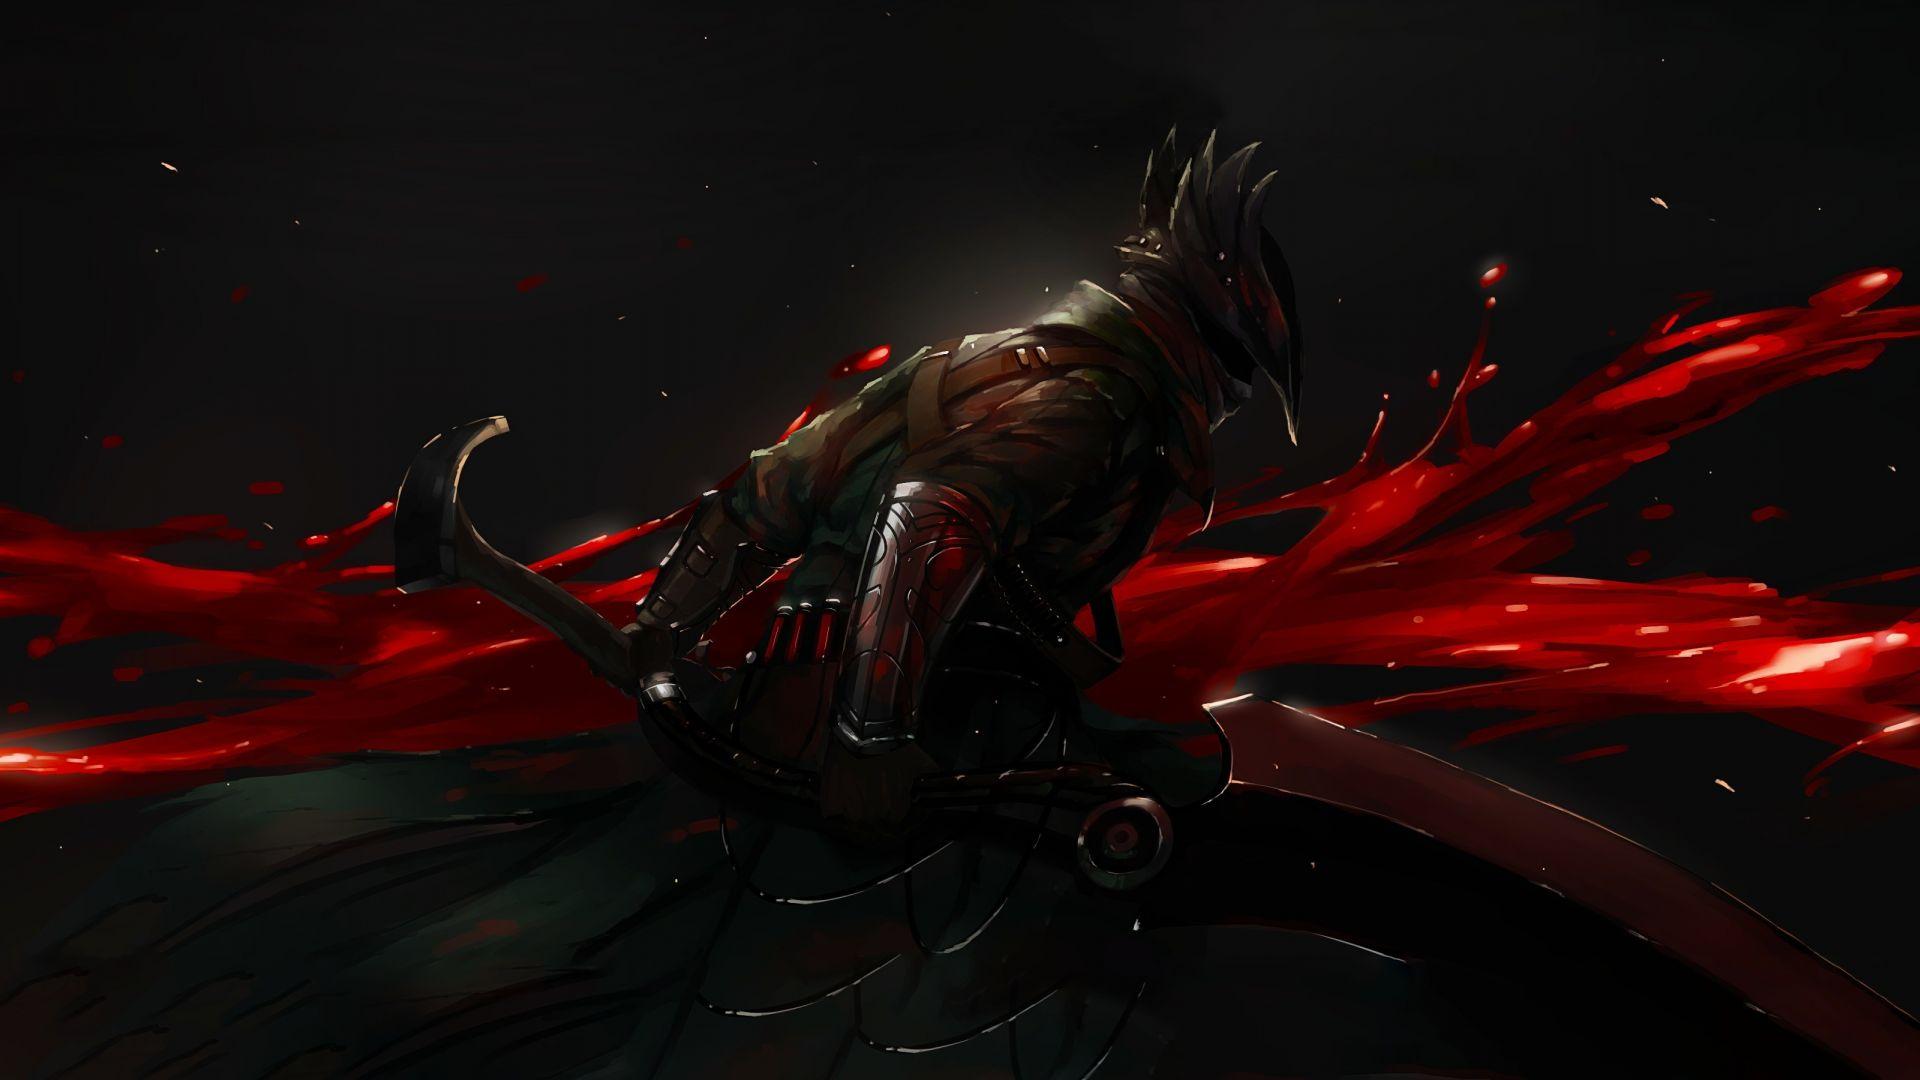 Bloodborne Hd Wallpaper 3